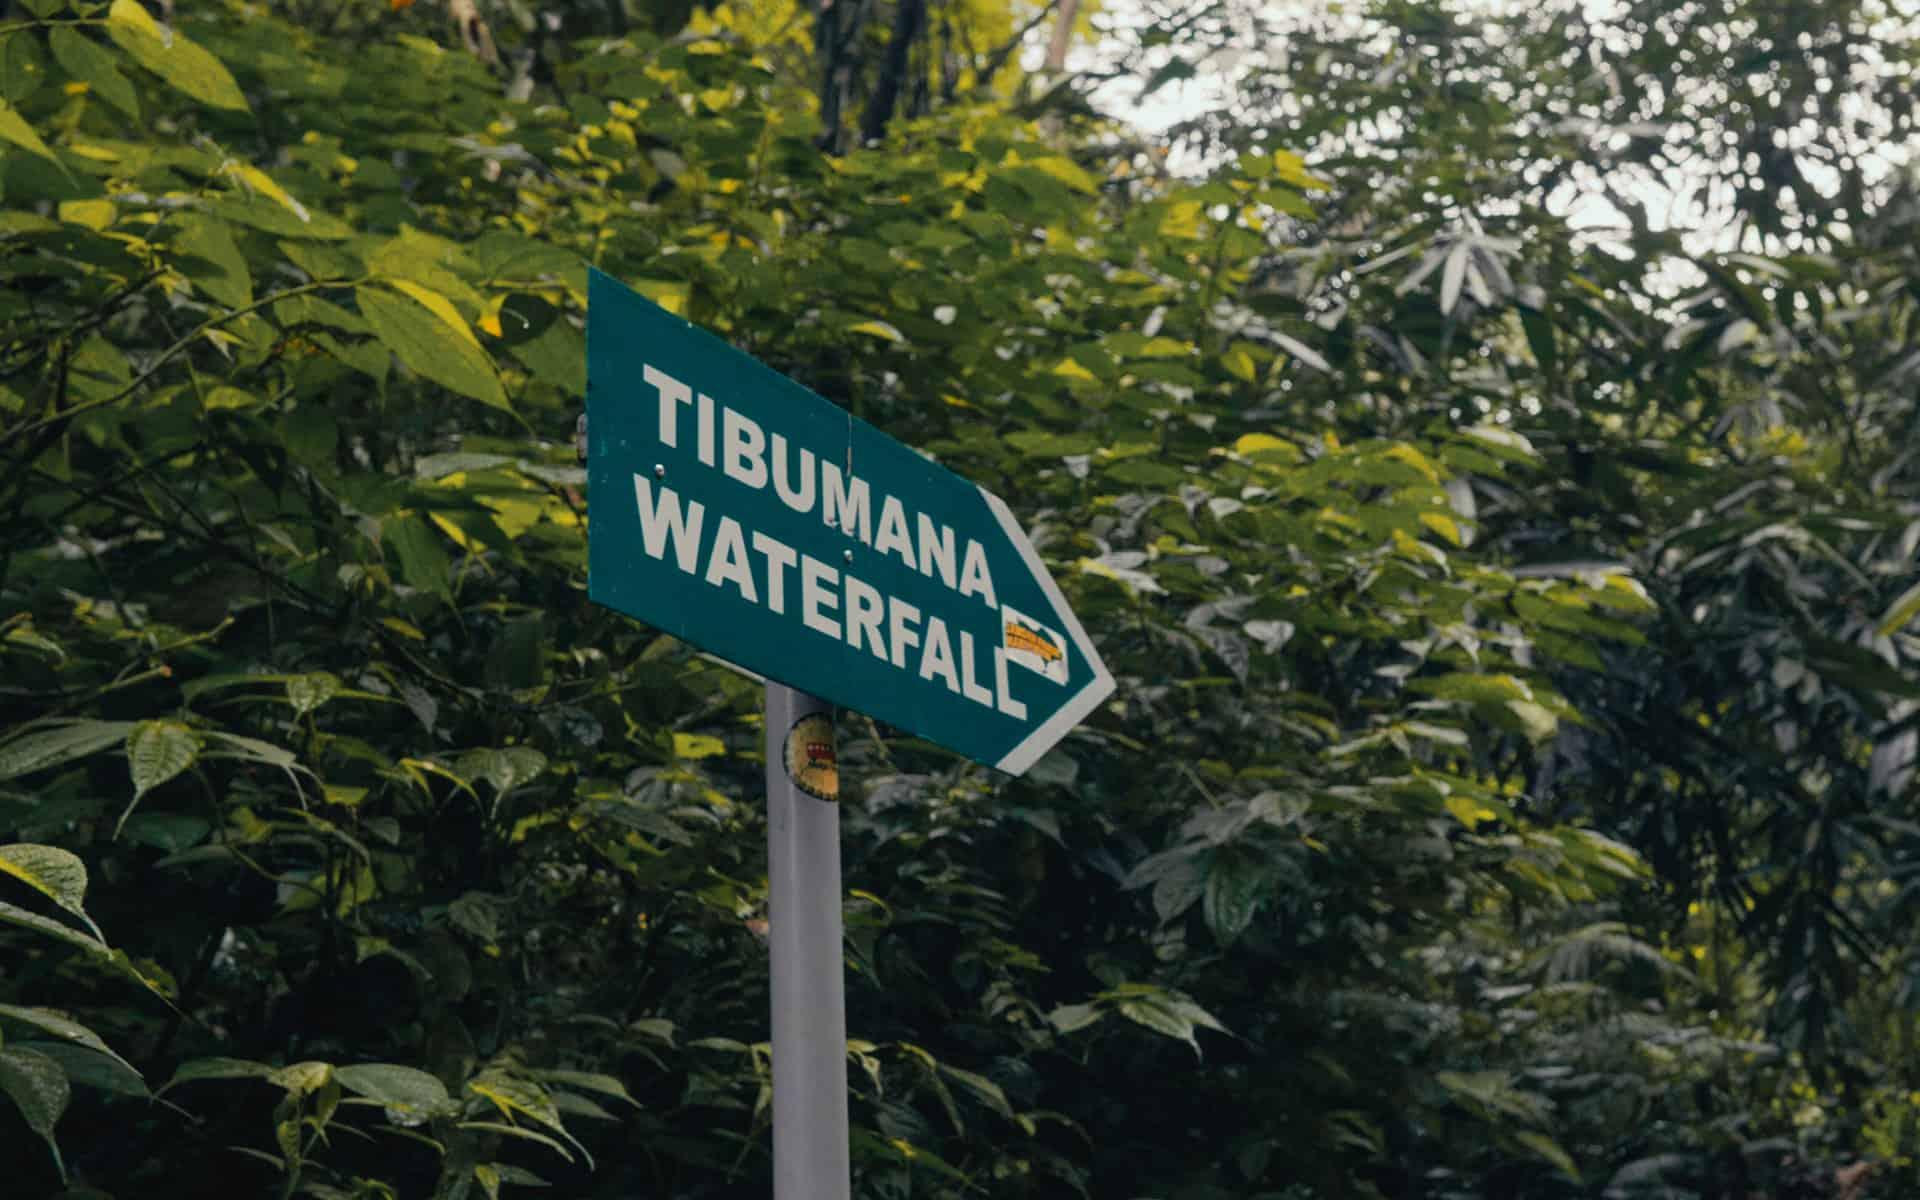 tibumana-waterfall-bali-sign